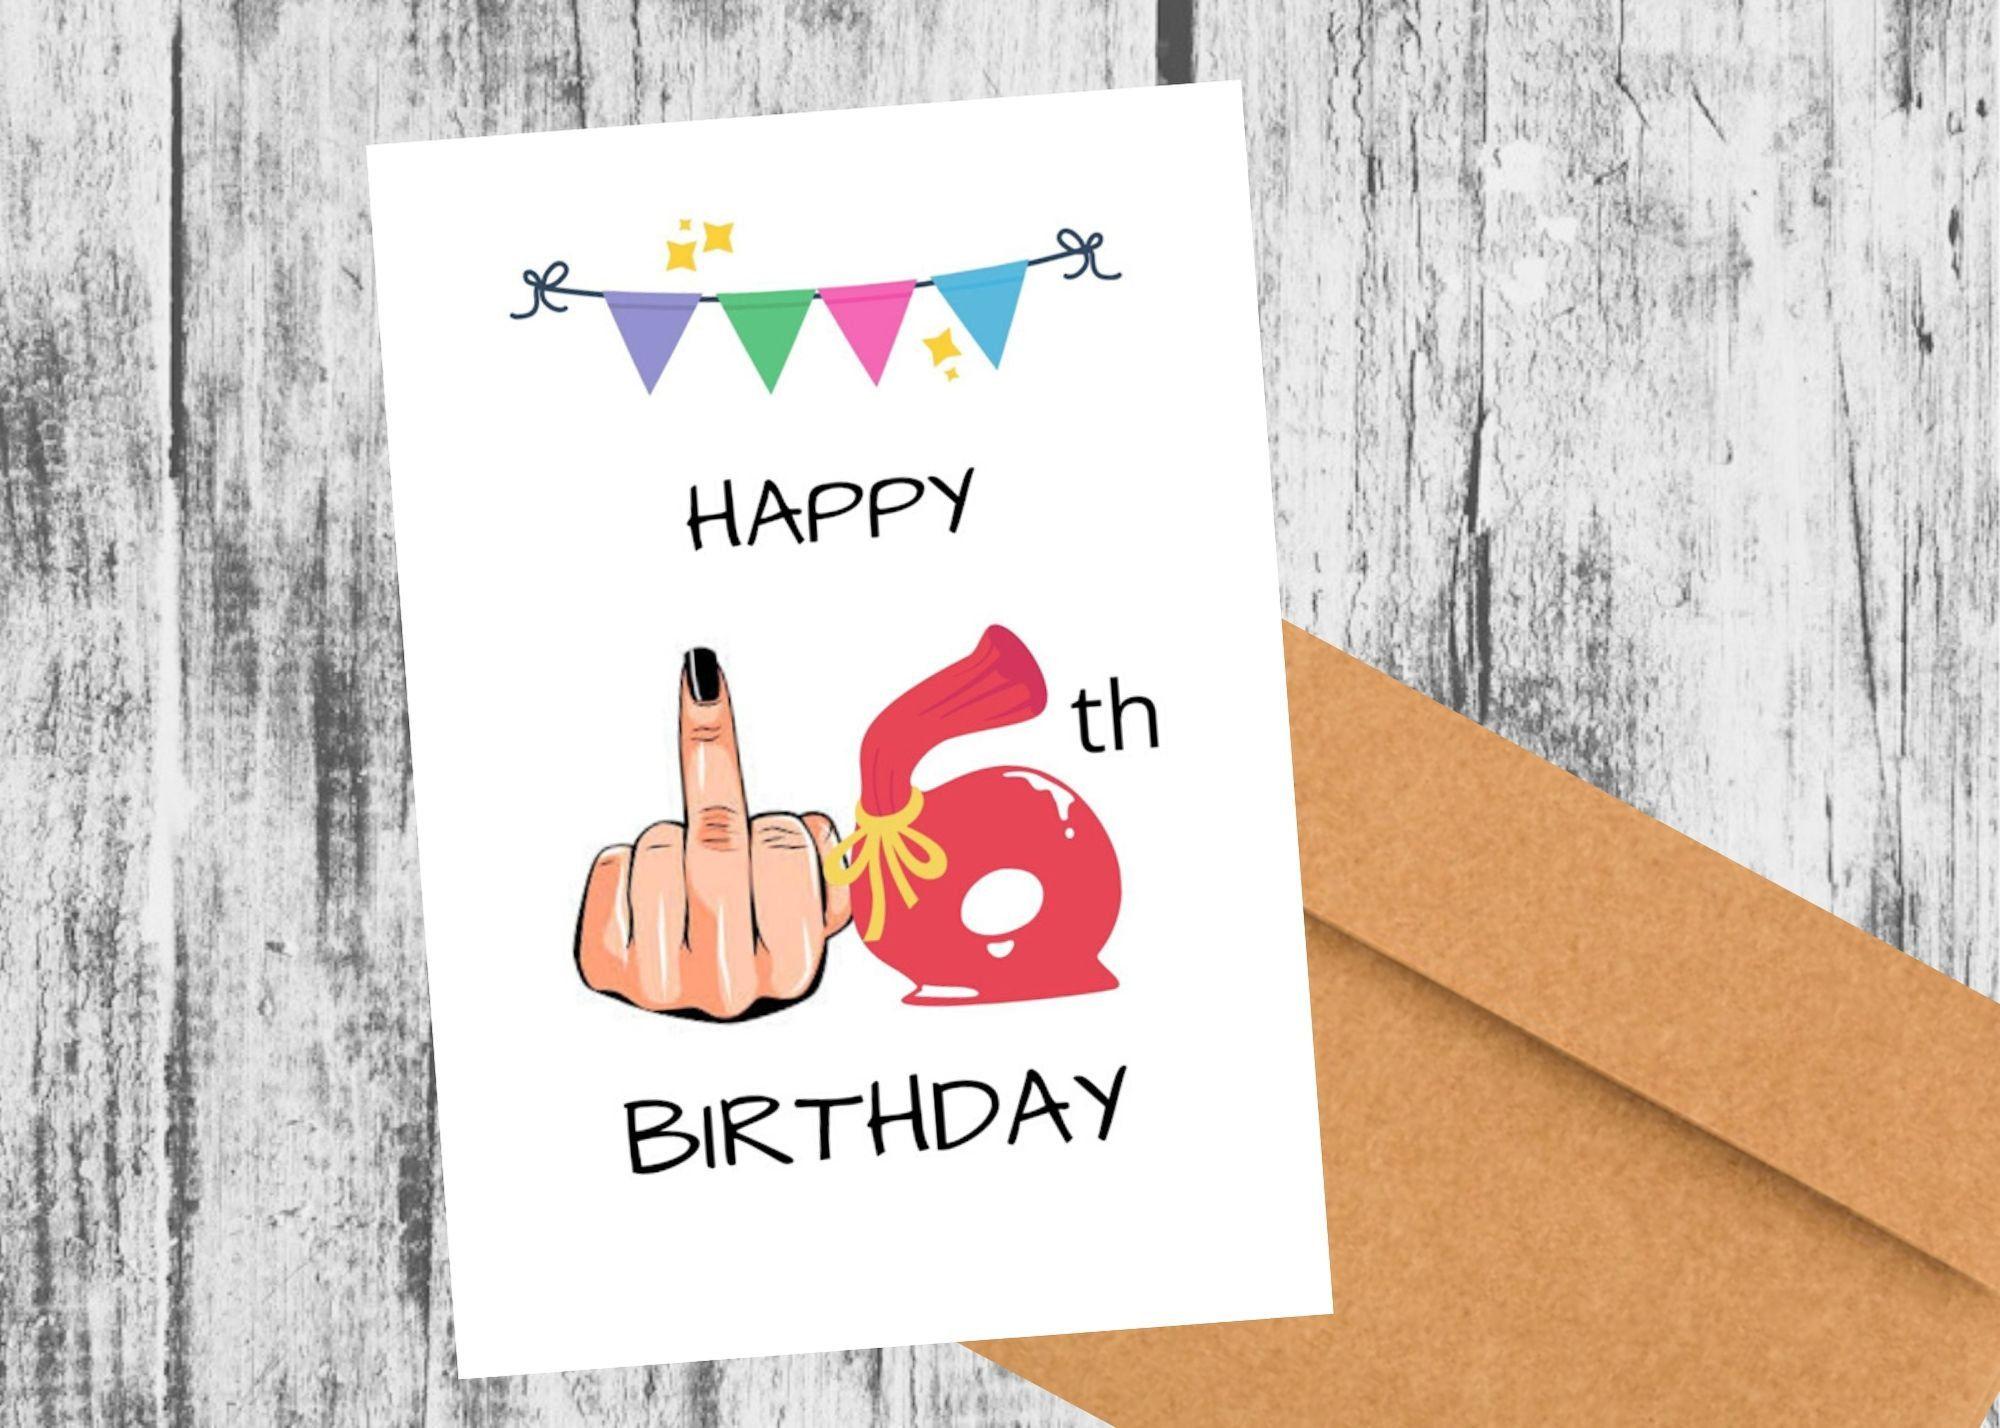 Milestone Sweet 16 Happy 16th Birthday Card Funny Birthday Card For Her Him Brother Sister So Happy Anniversary Cards 21st Birthday Cards 18th Birthday Cards